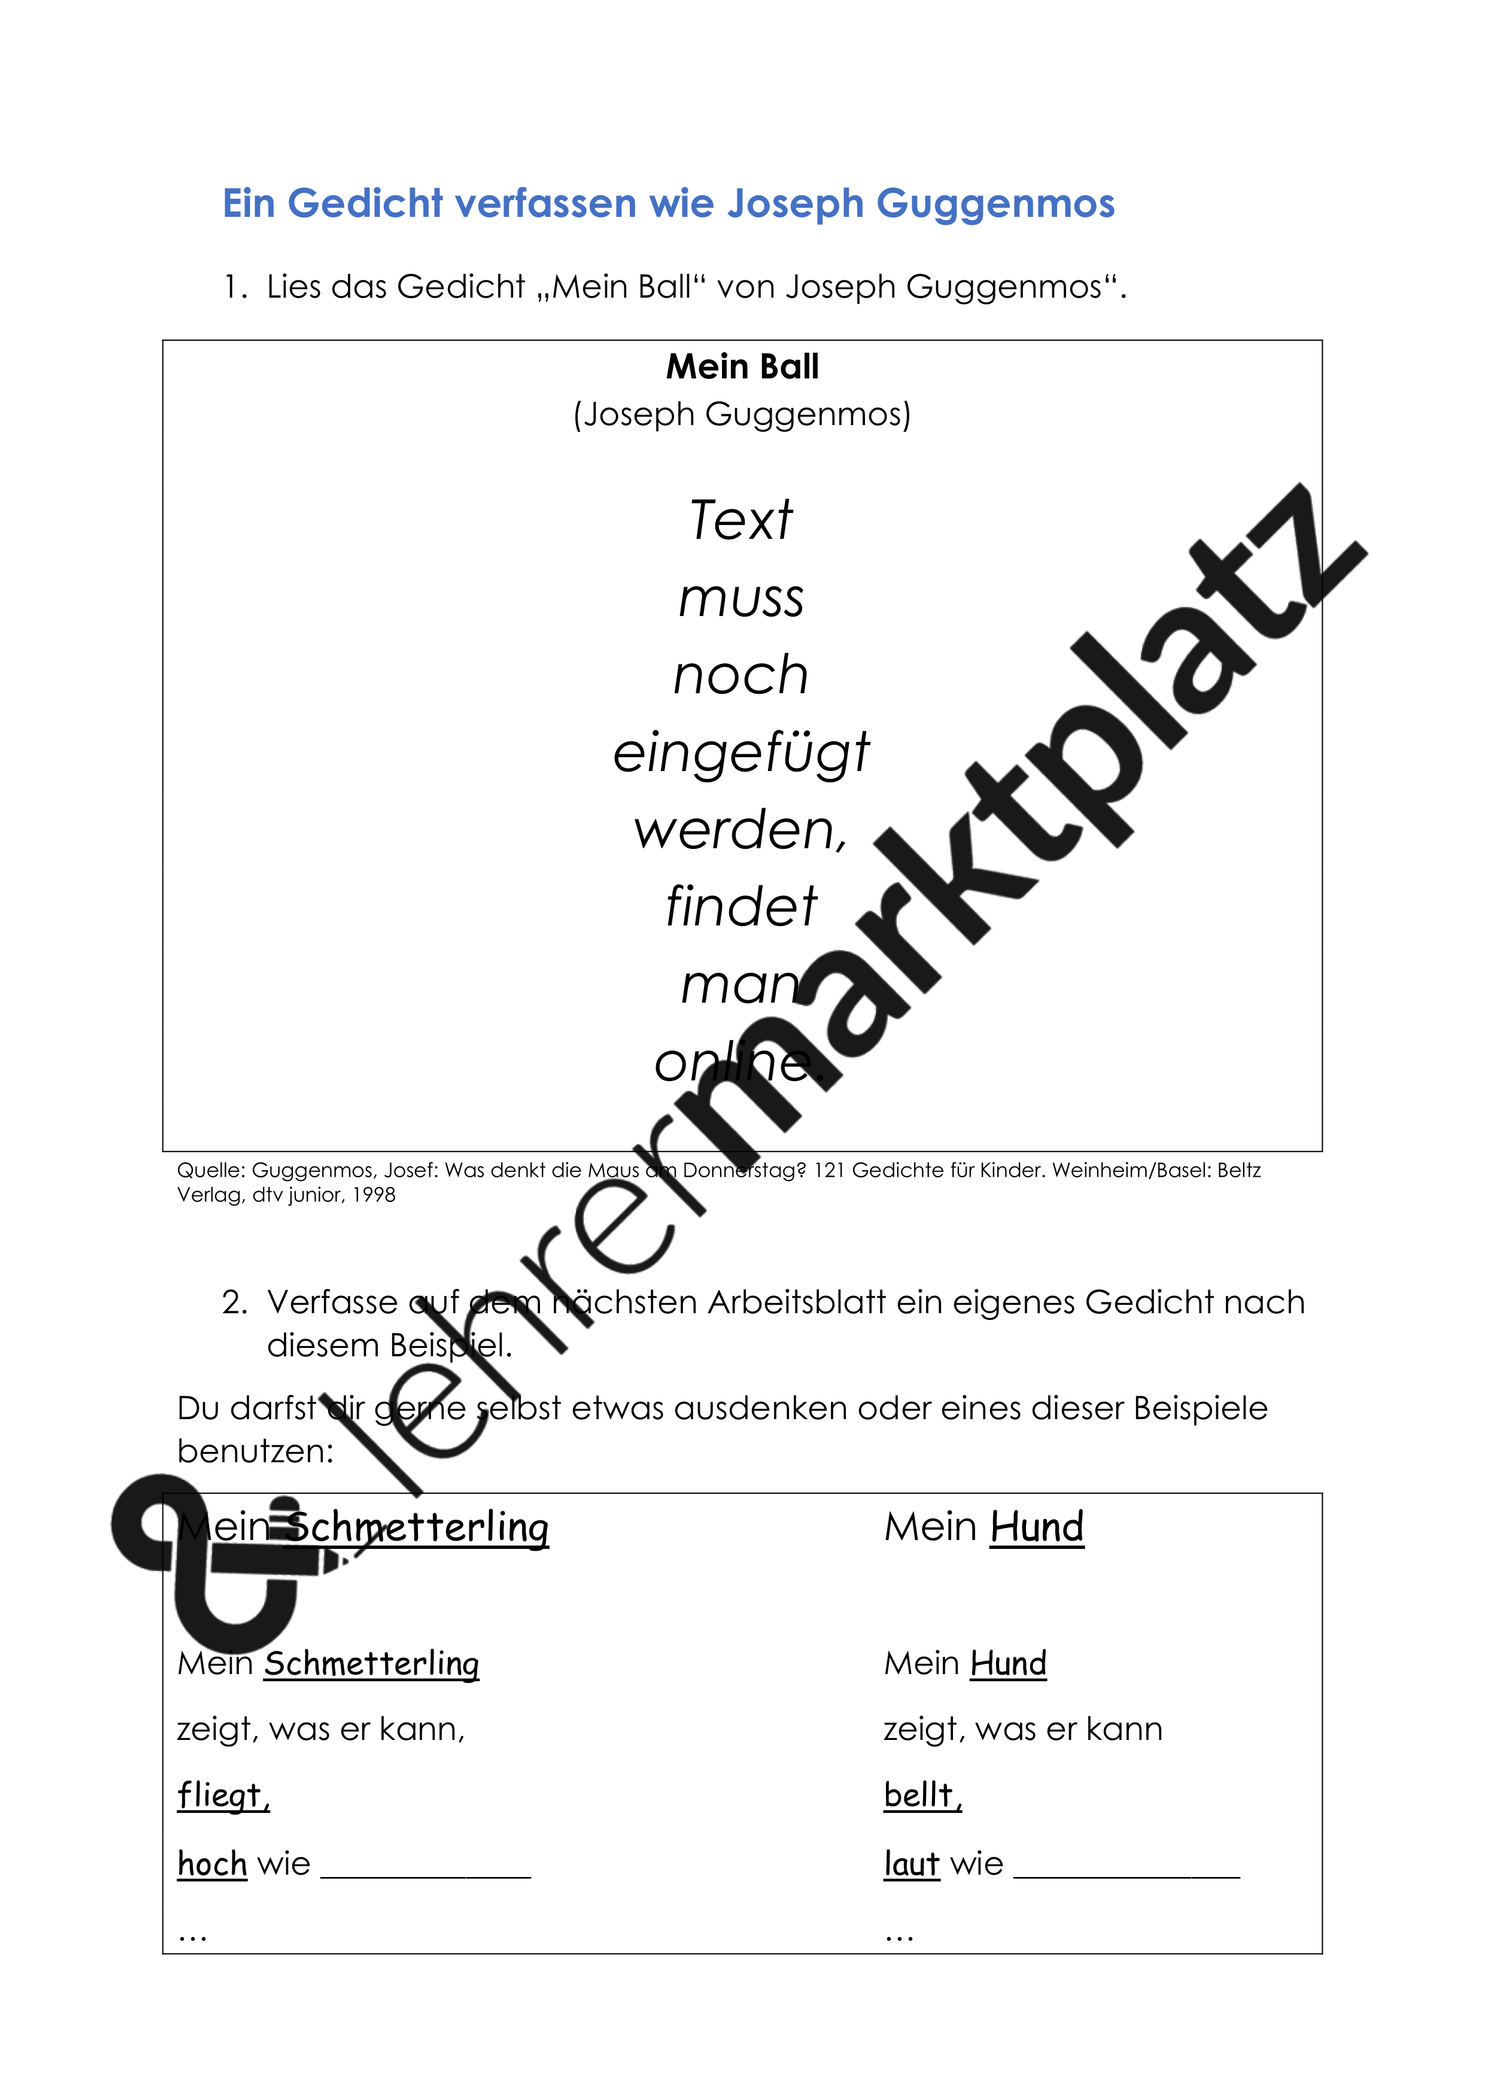 Deutschunterricht Joseph Guggenmos Mein Ball Download Deutsch Unterricht Unterrichtsmaterial Und Lesen